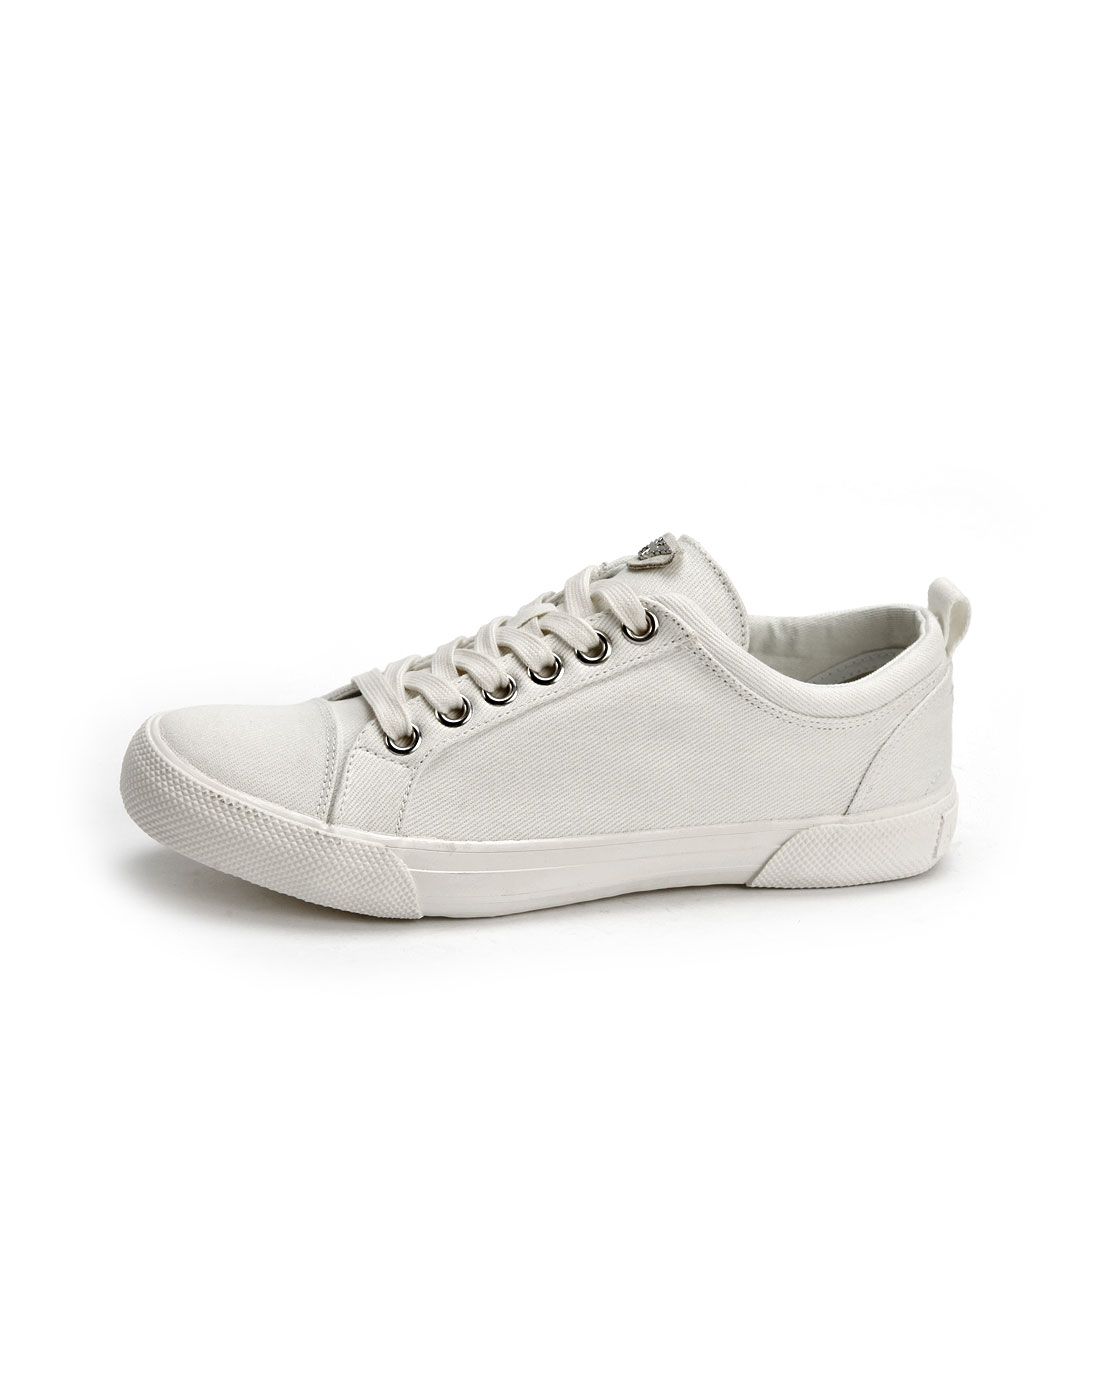 armani鞋子专场aj男款白色布面时尚绑带休闲鞋